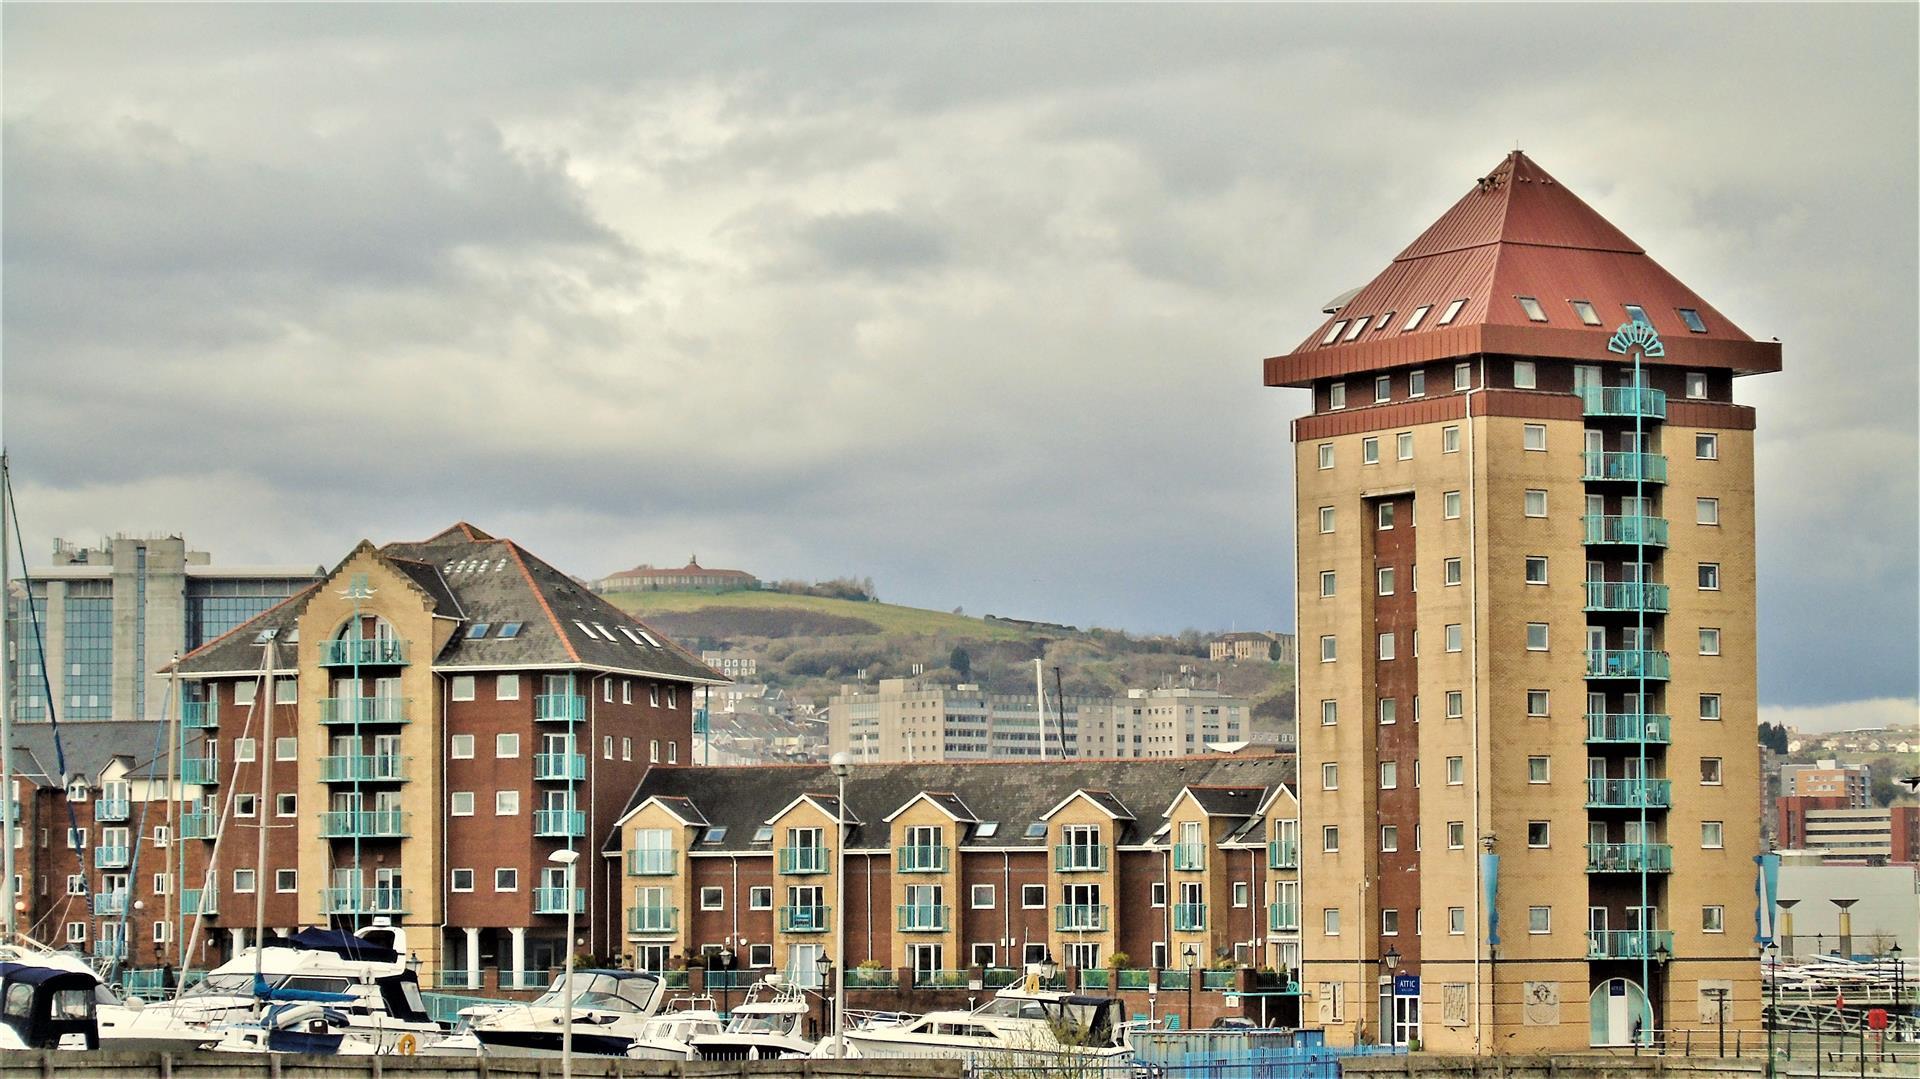 Pocketts Wharf, Marina, Swansea, SA1 3XL